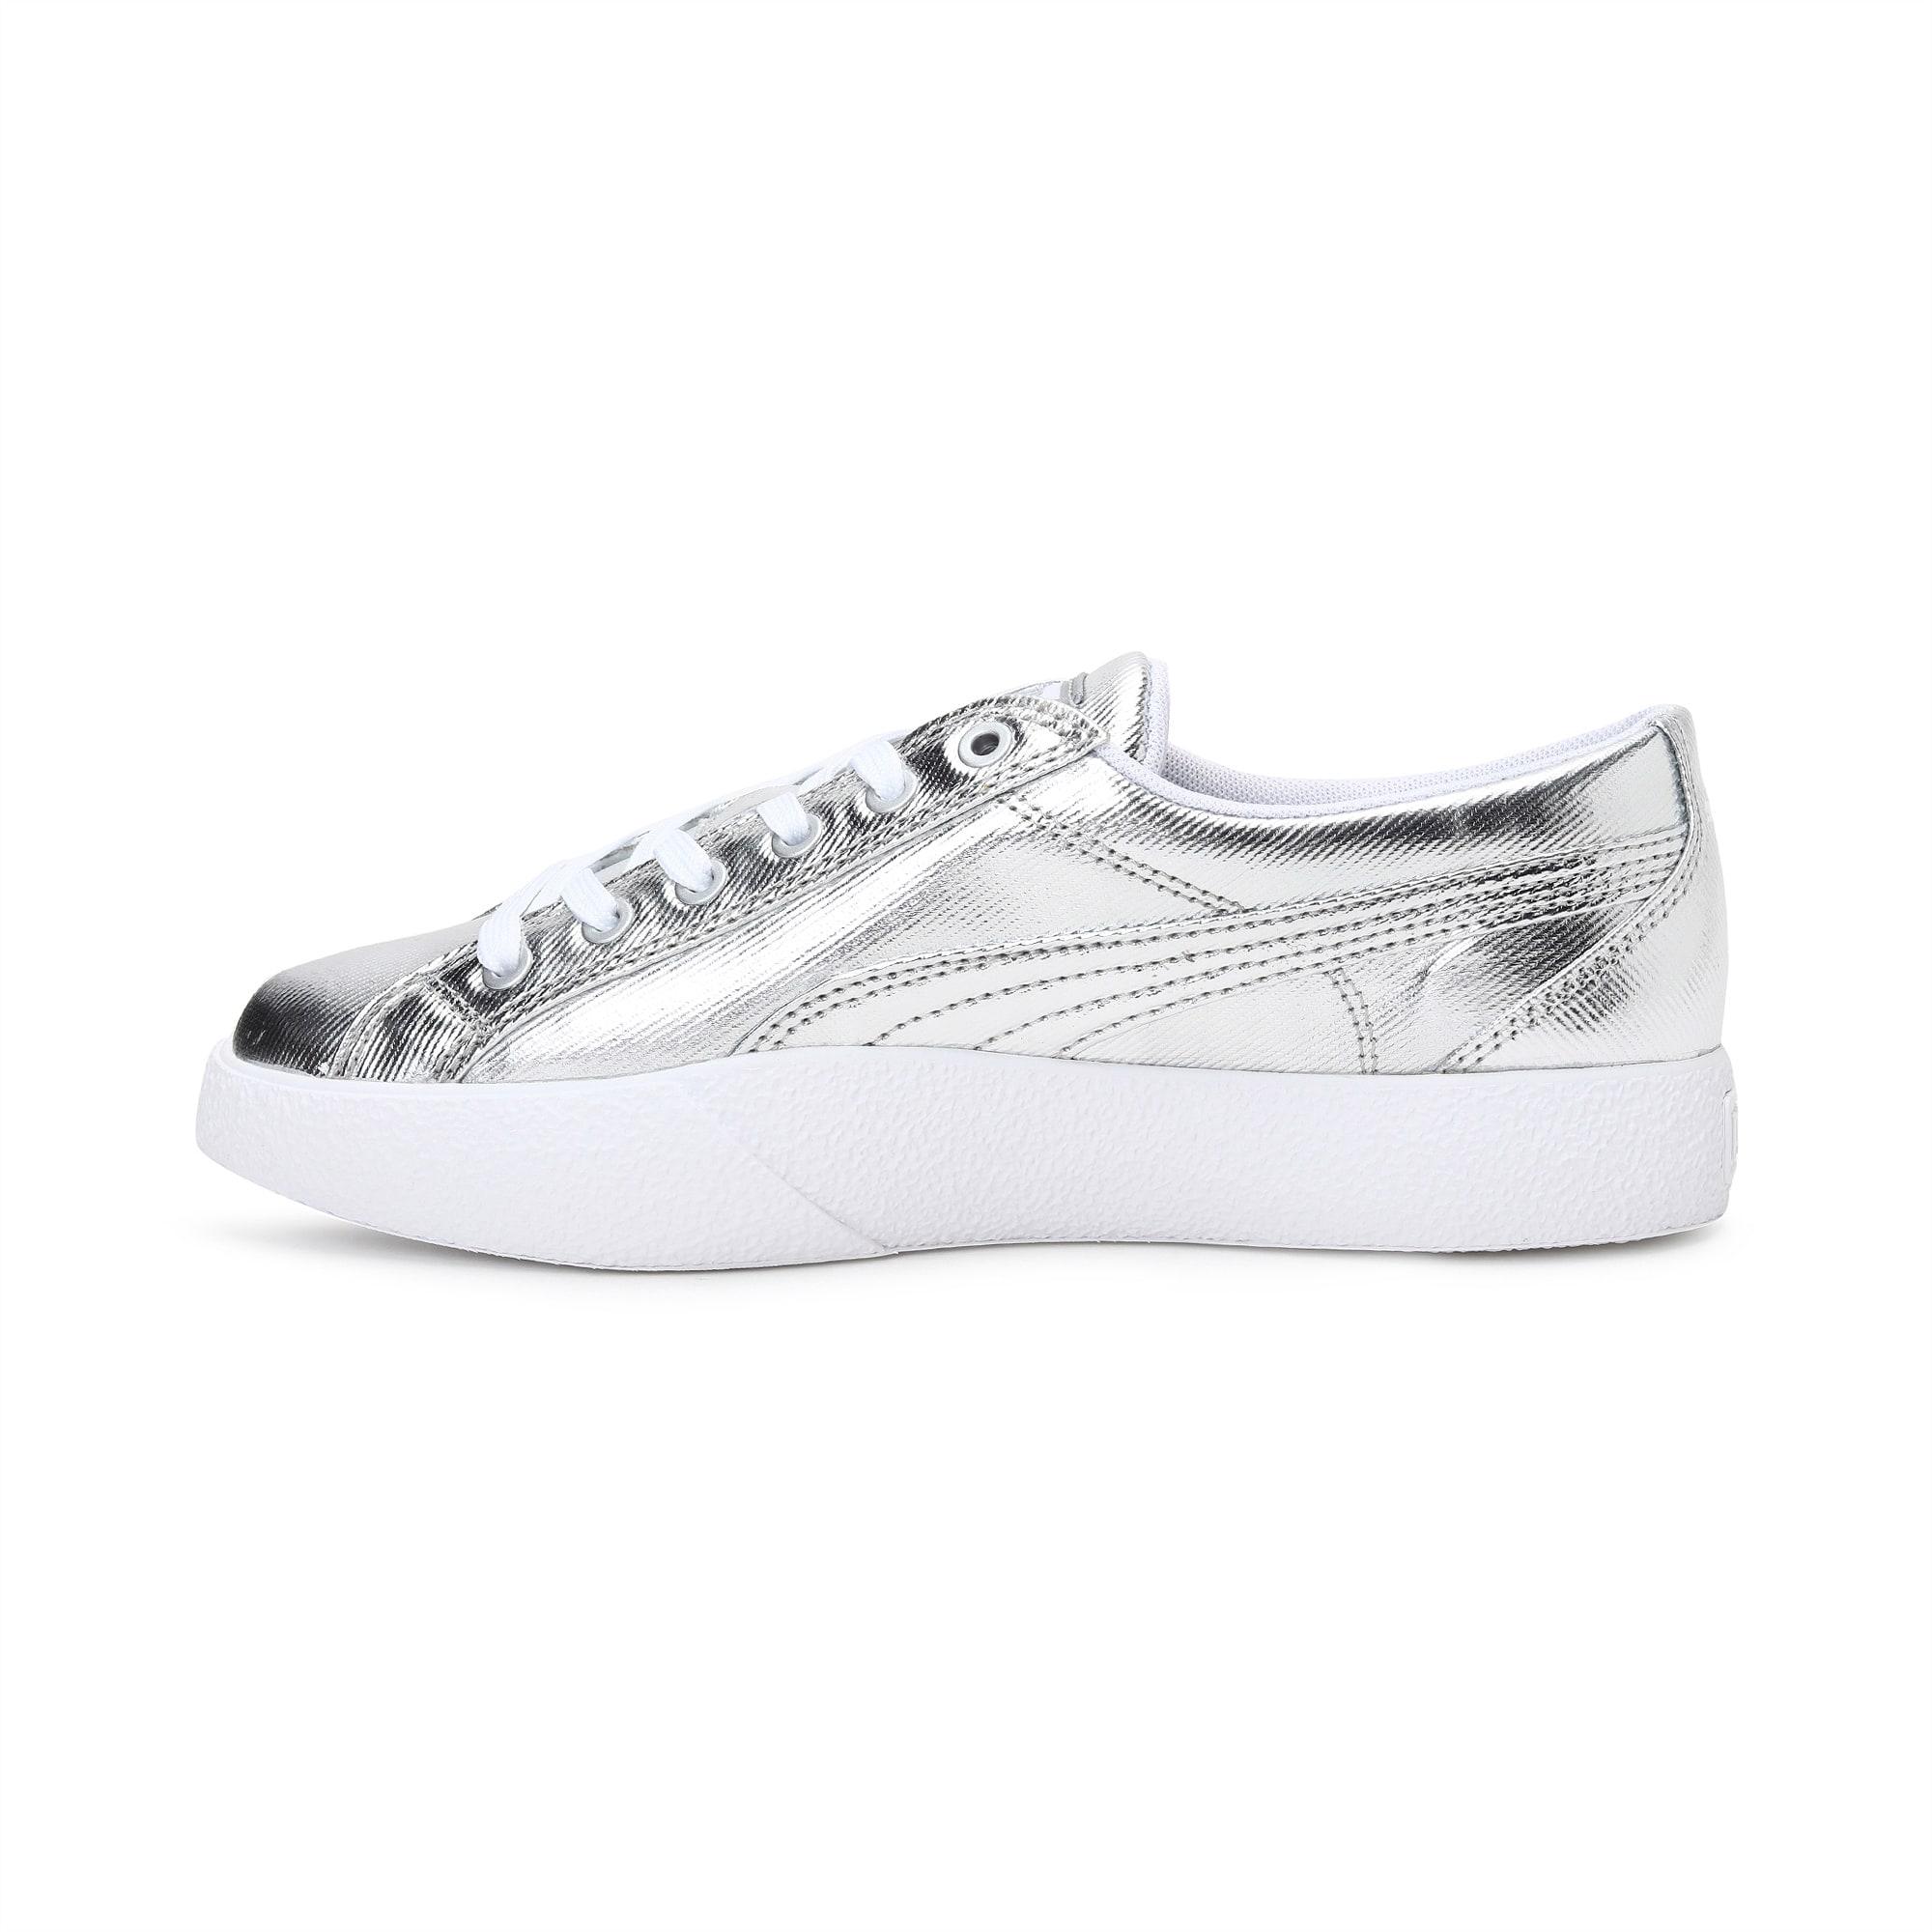 Familiar Derechos de autor arrepentirse  Love Metallic Women's Shoes | Puma Silver | PUMA Footwear Special | PUMA